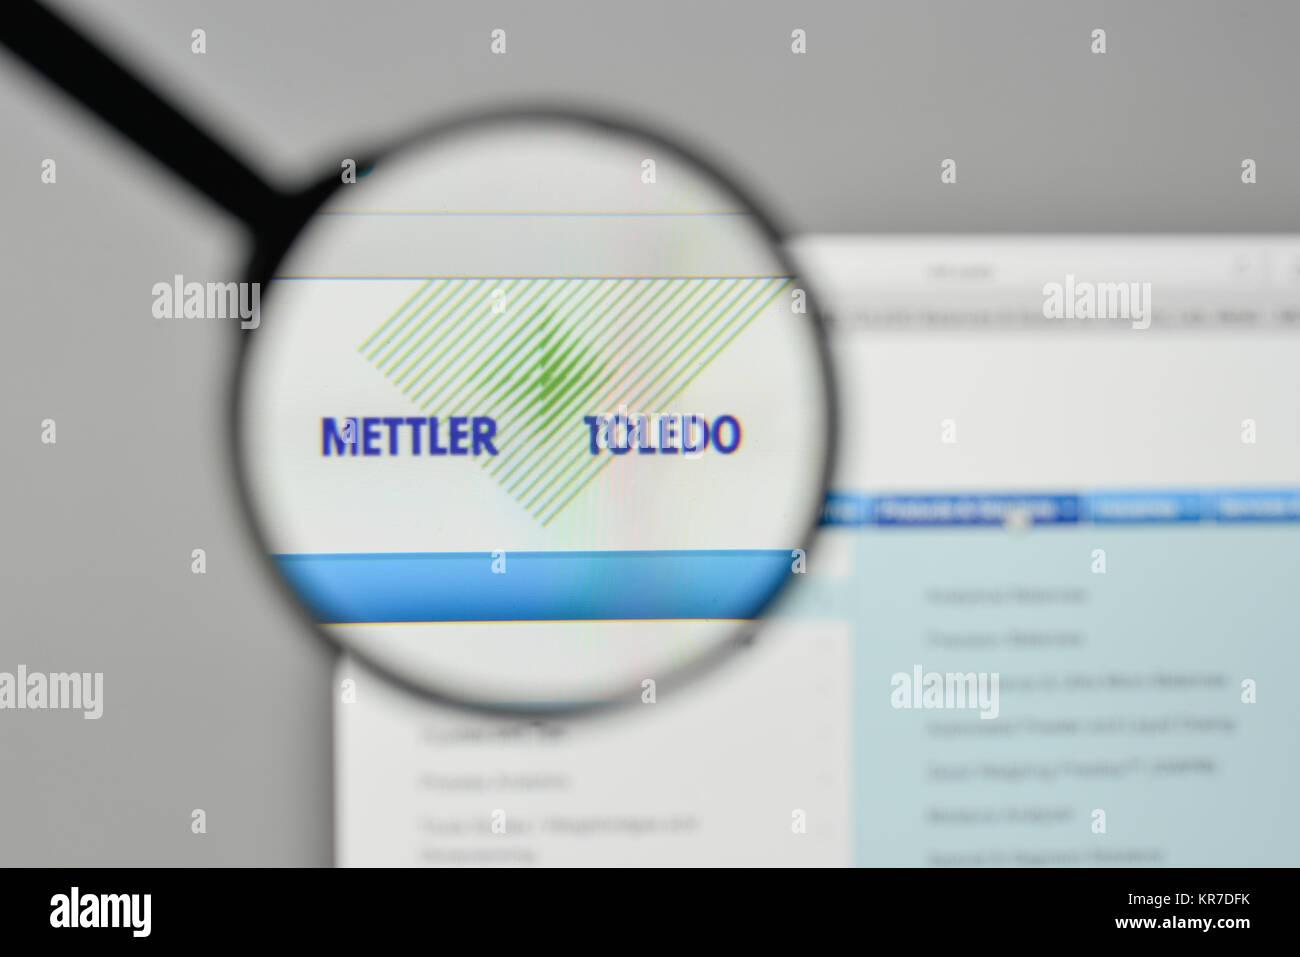 Milan, Italy - November 1, 2017: Mettler Toledo